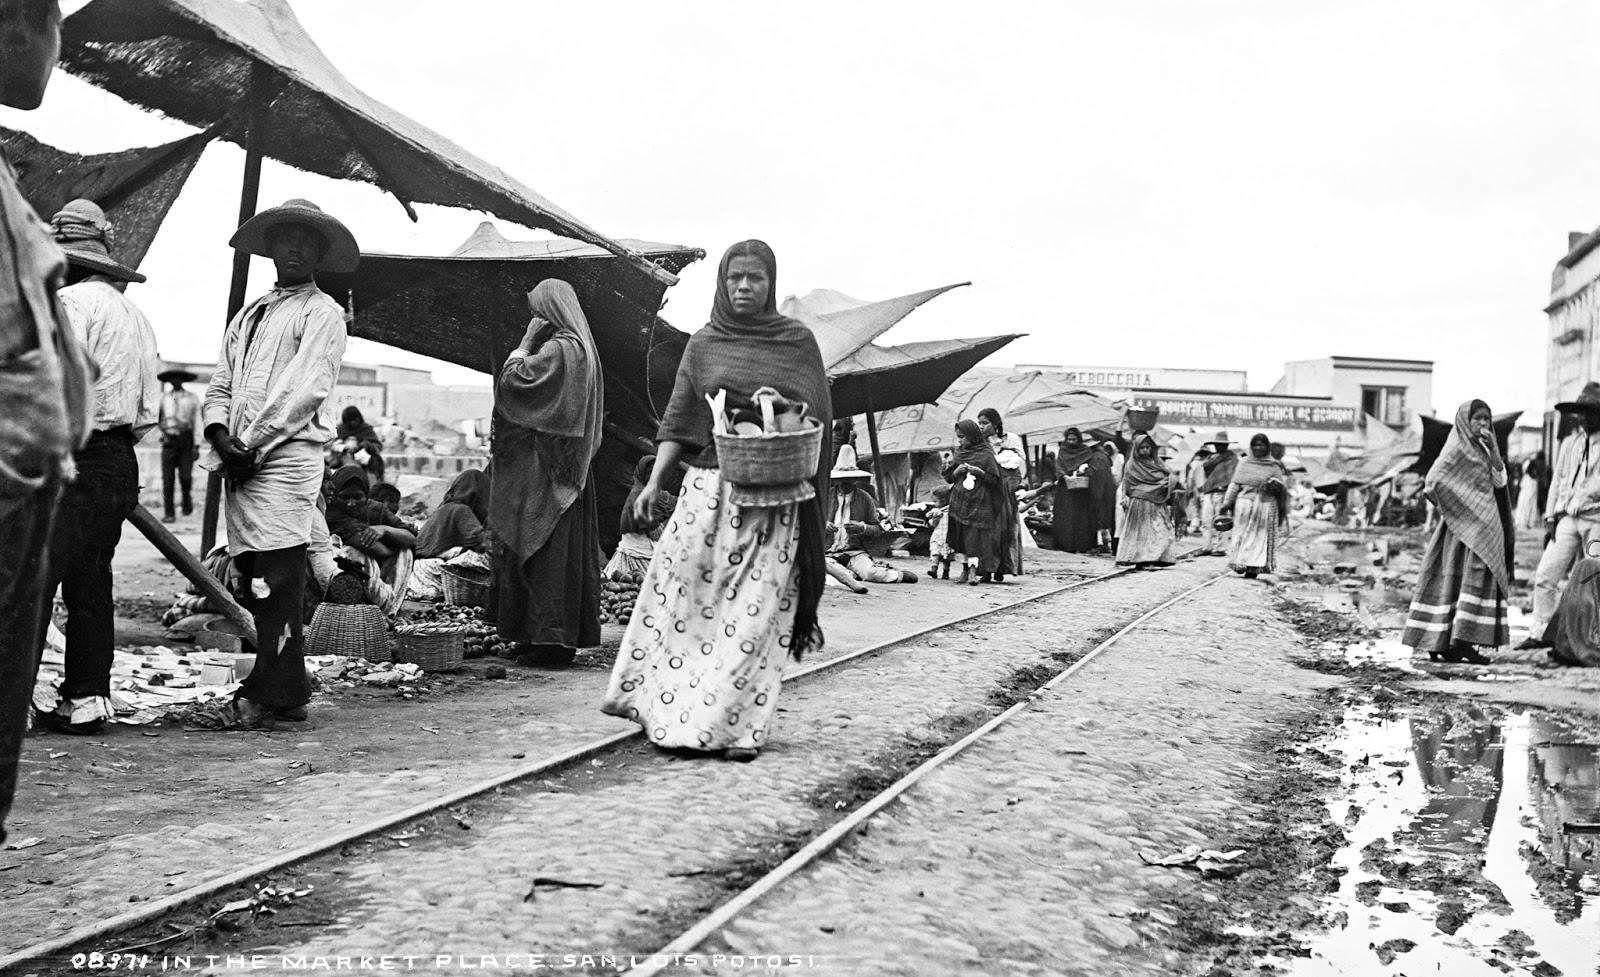 In the market place, San Luis Potosí, Mexico, 1880-97b (1)